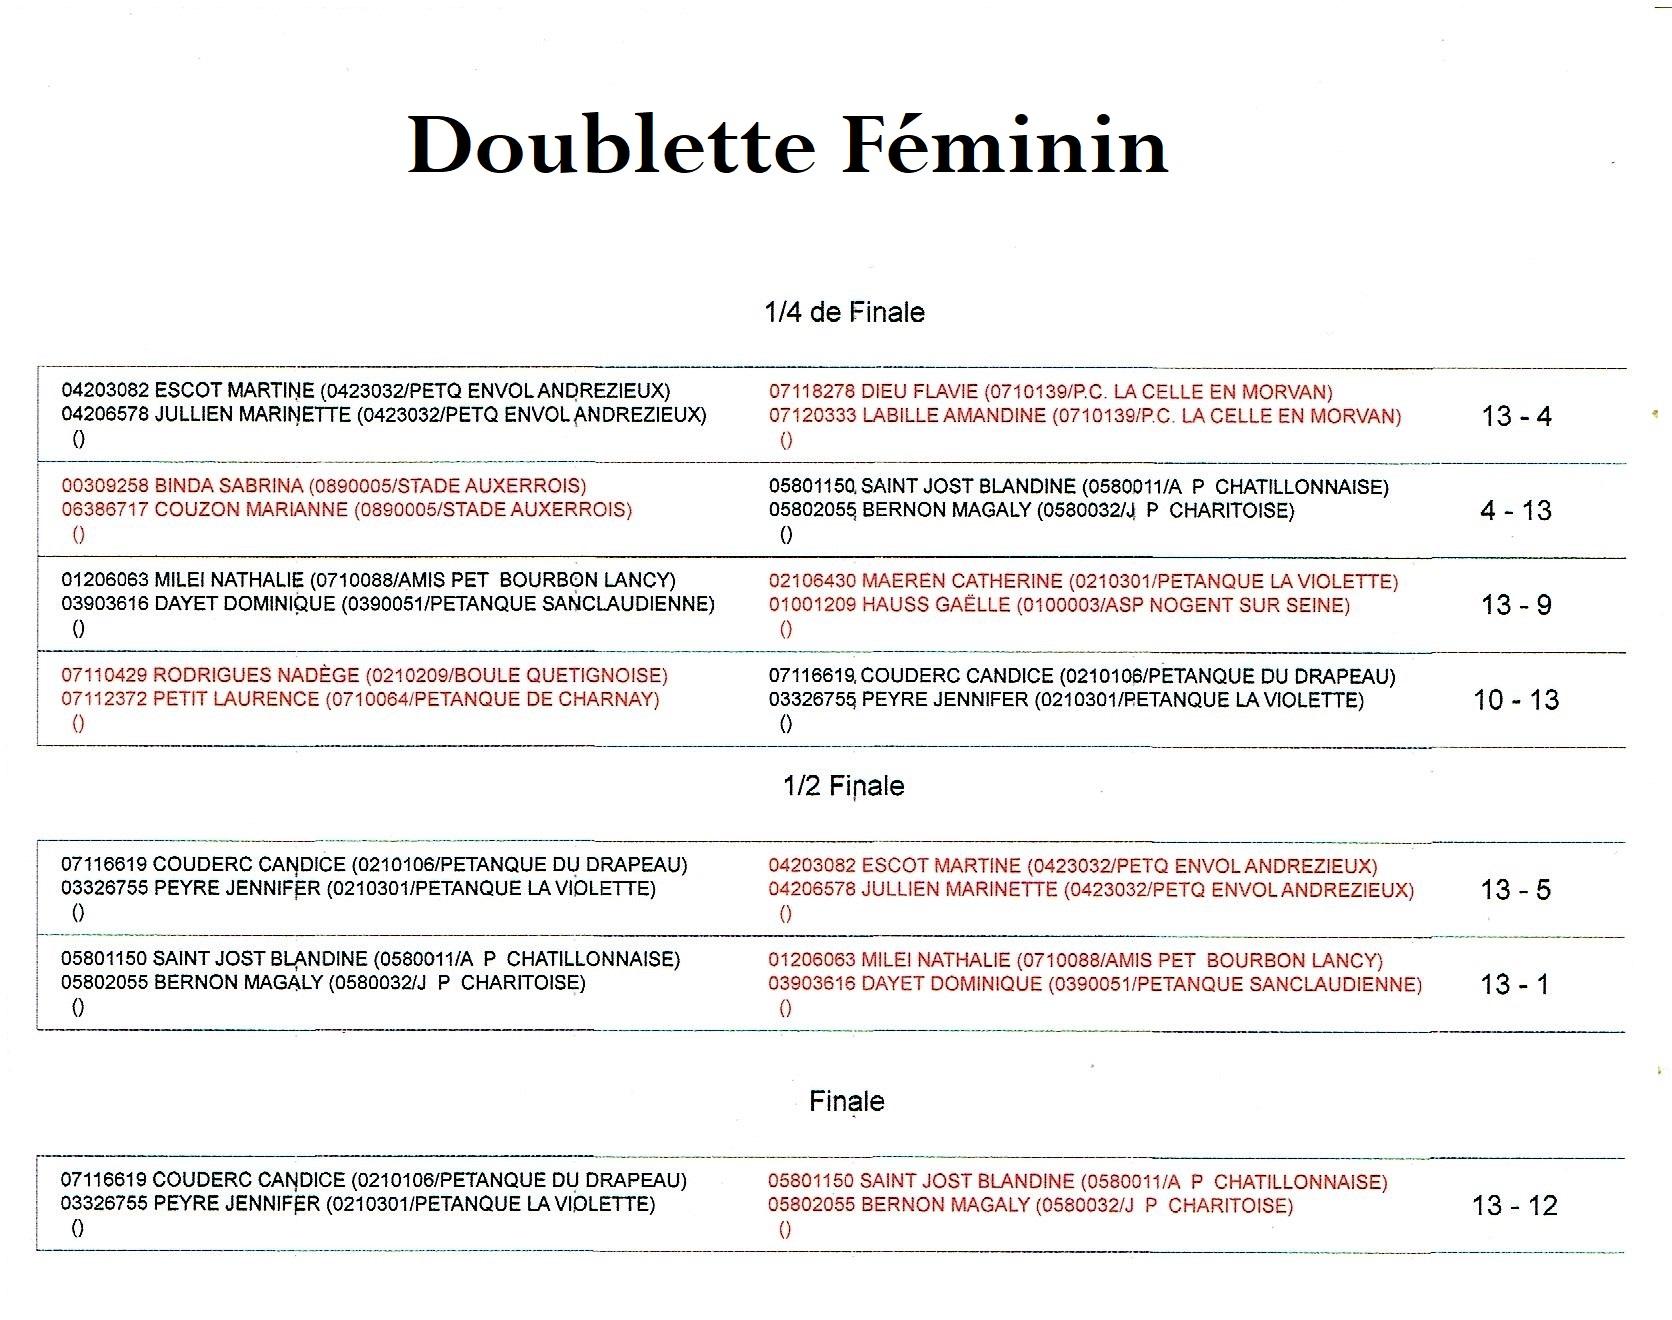 Resultats doublette feminin